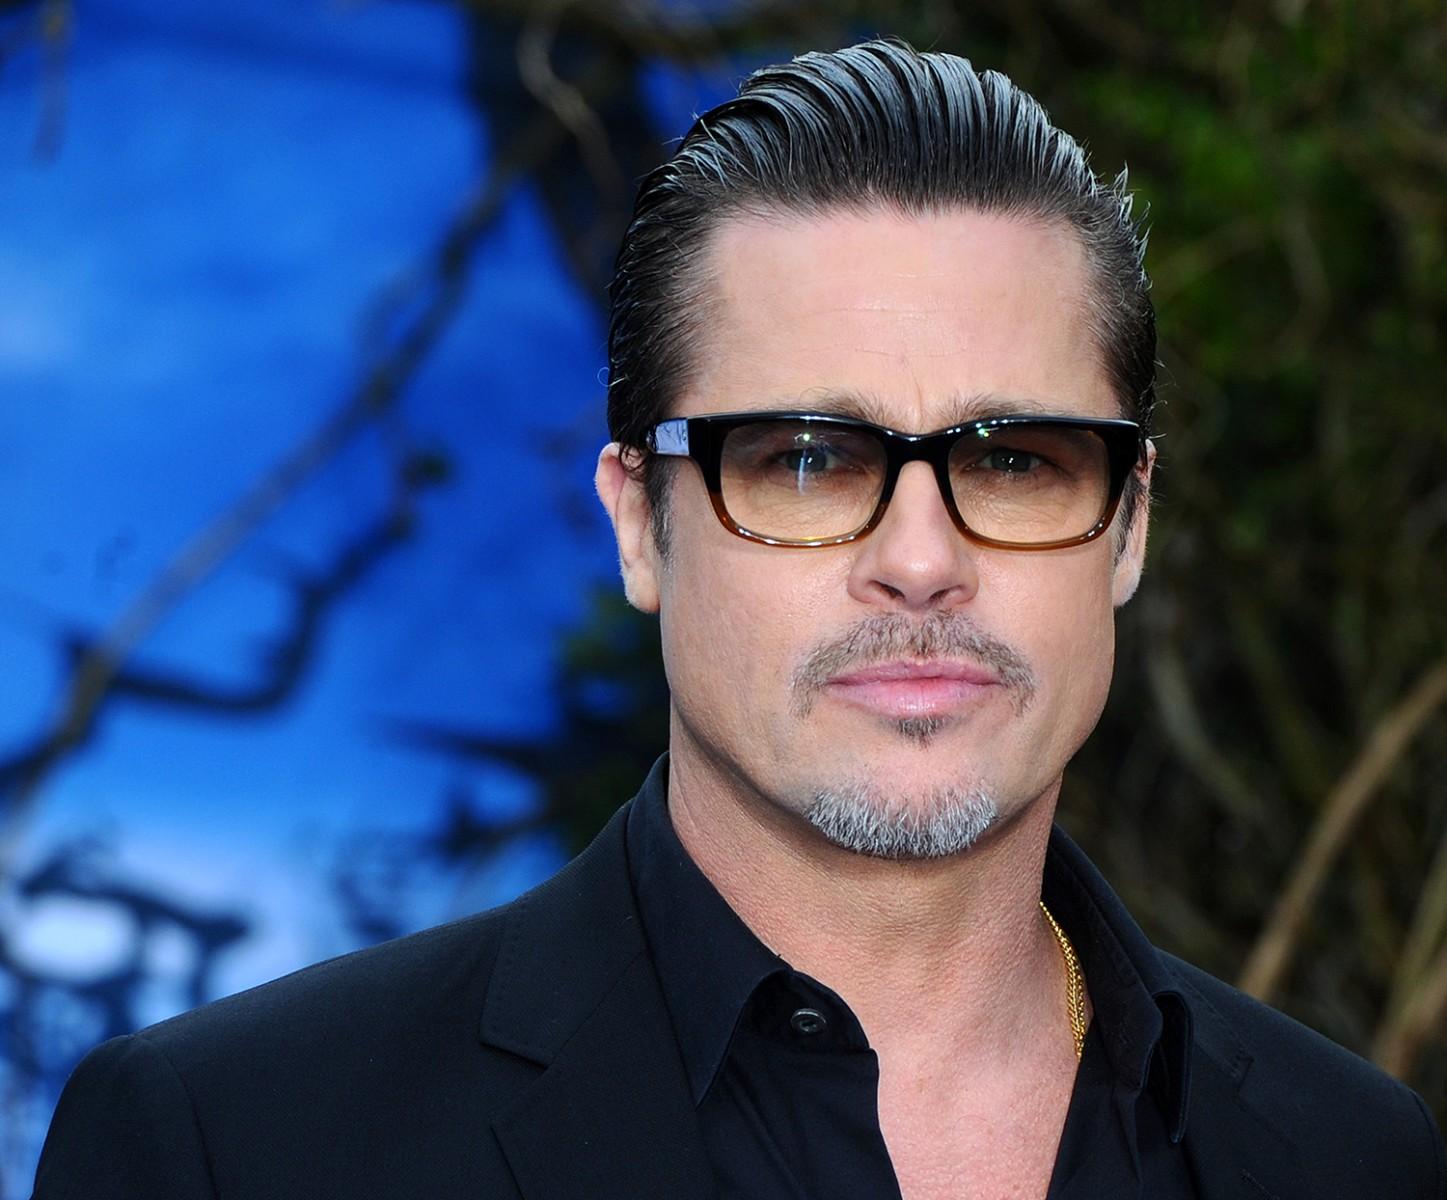 Beard envy? Hipster trend sparks interest in facial hair ...